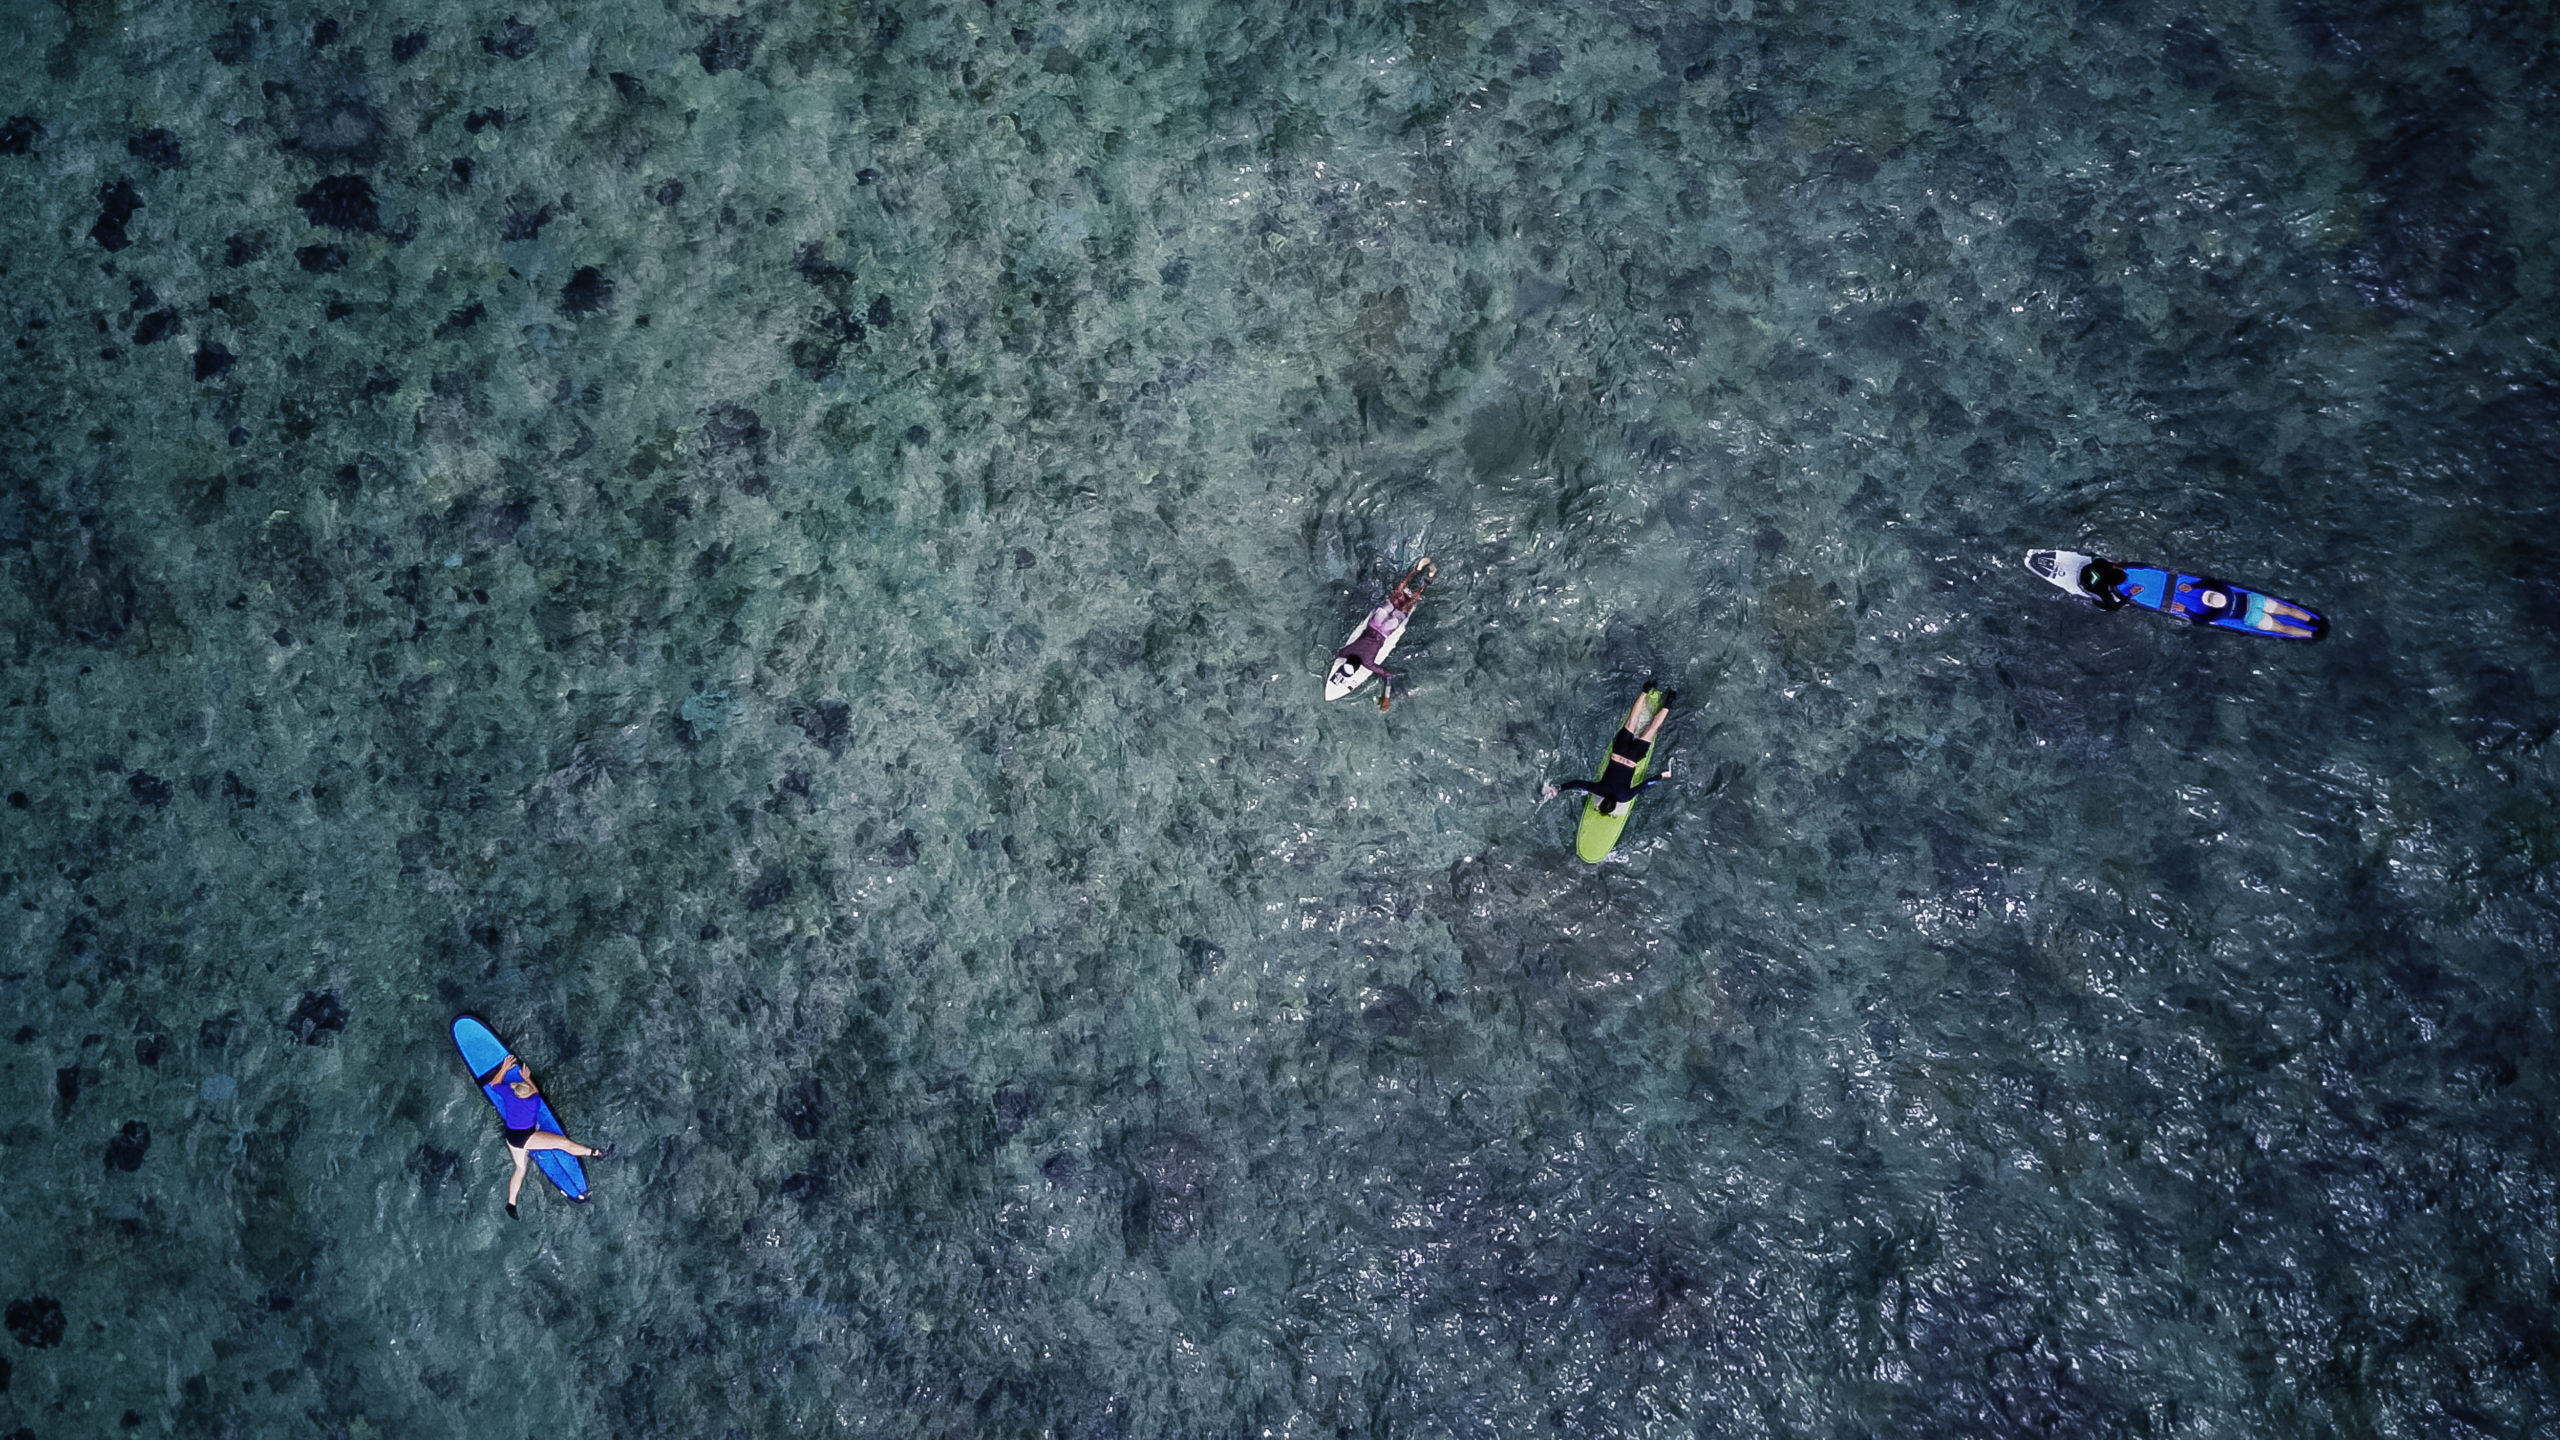 The New Bro surfing school Nusa Lembongan Bali Indonesia droneshot